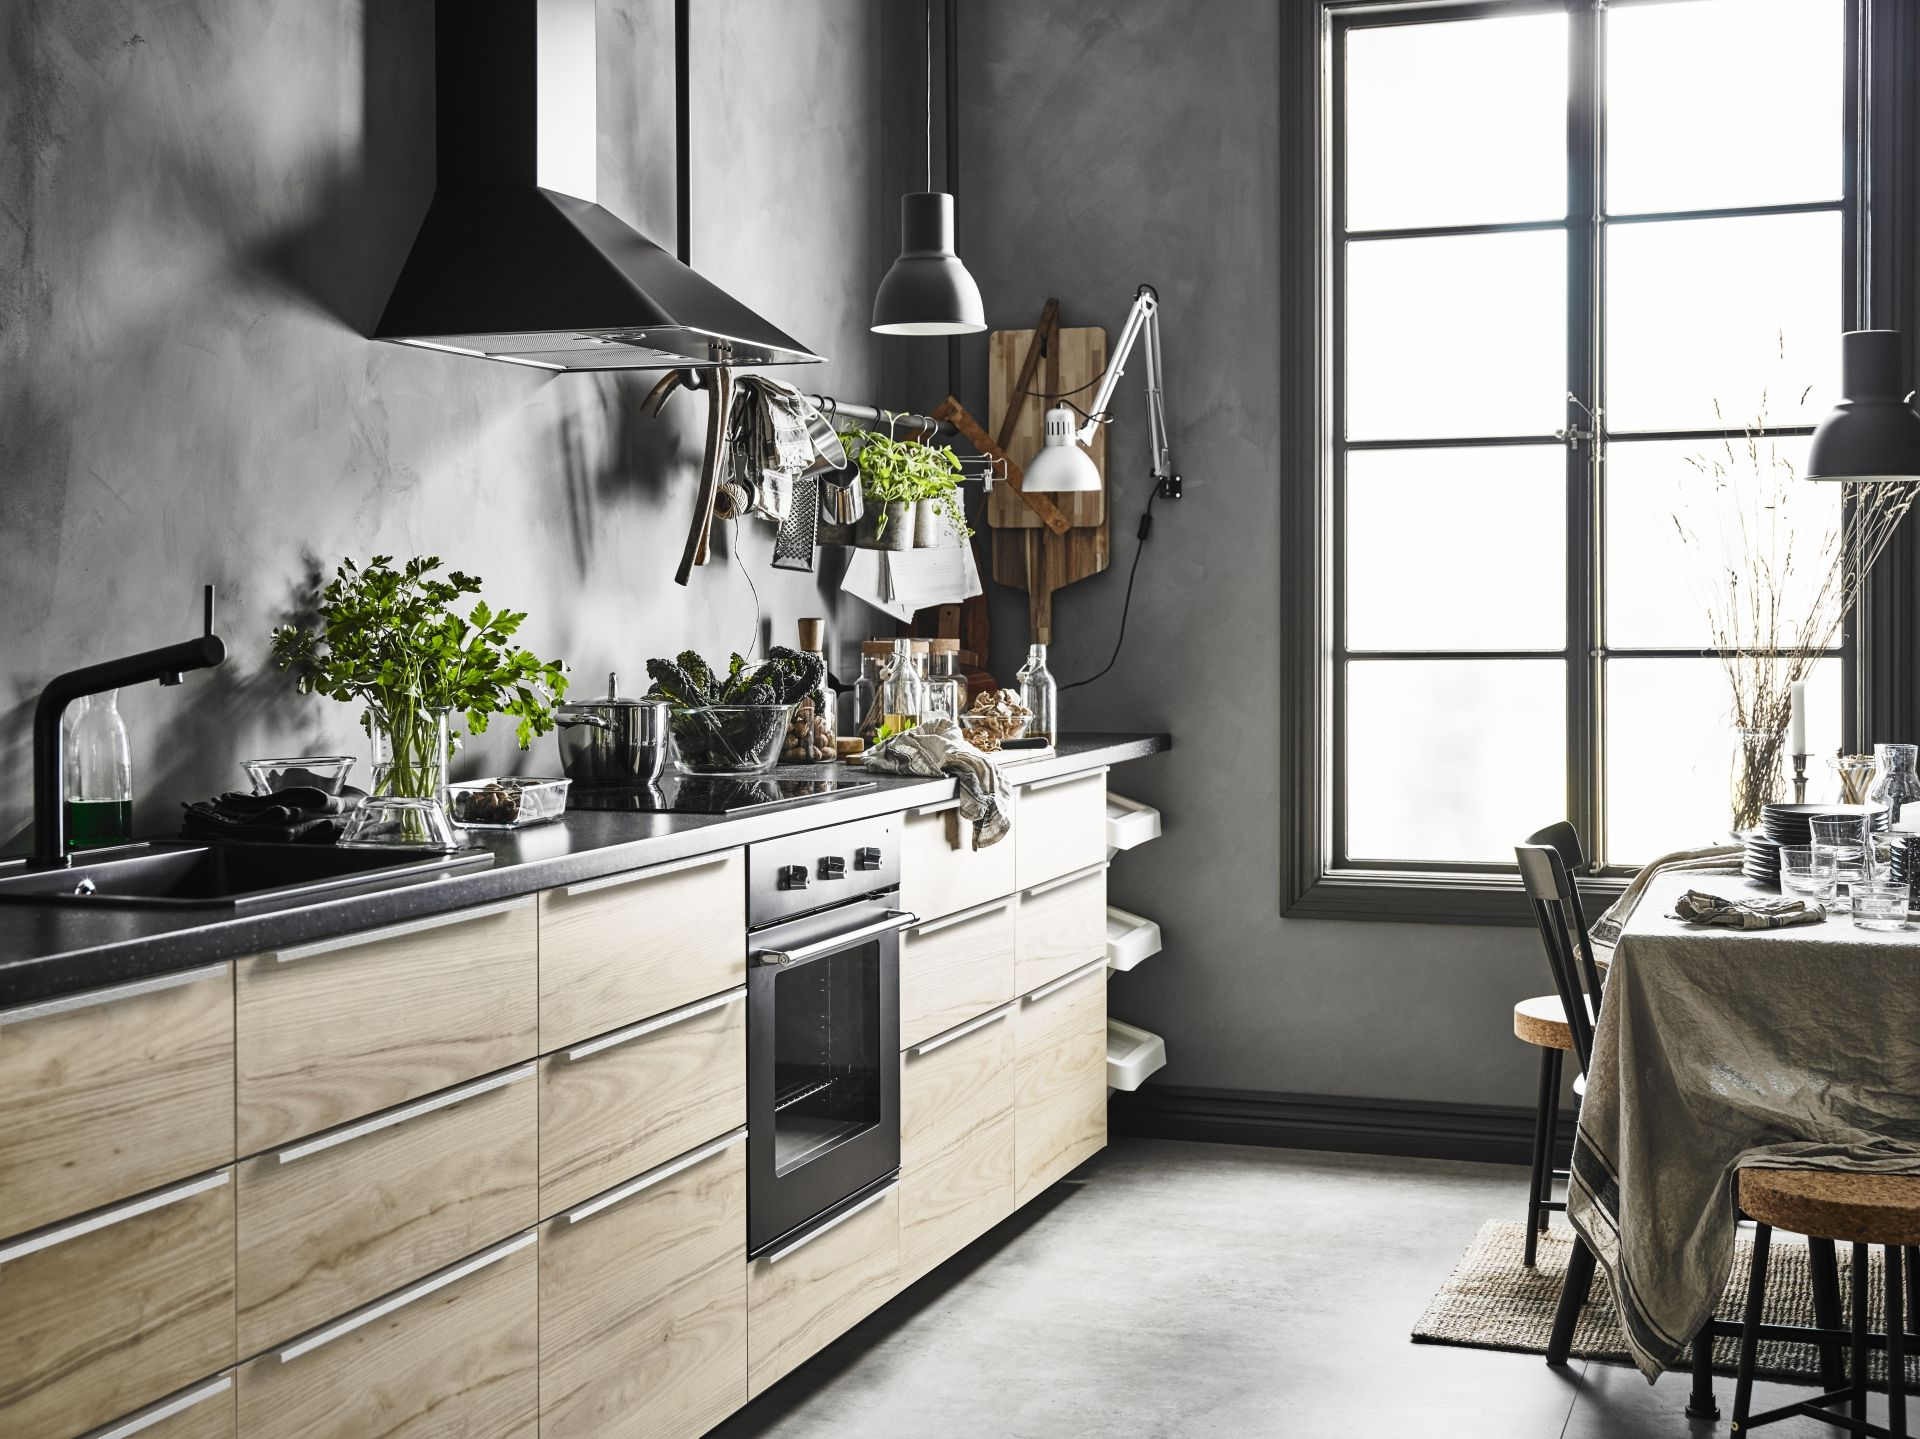 Opbergen Kleine Keuken : Metod askersund keuken ikea ikeanl ikeanederland interieur